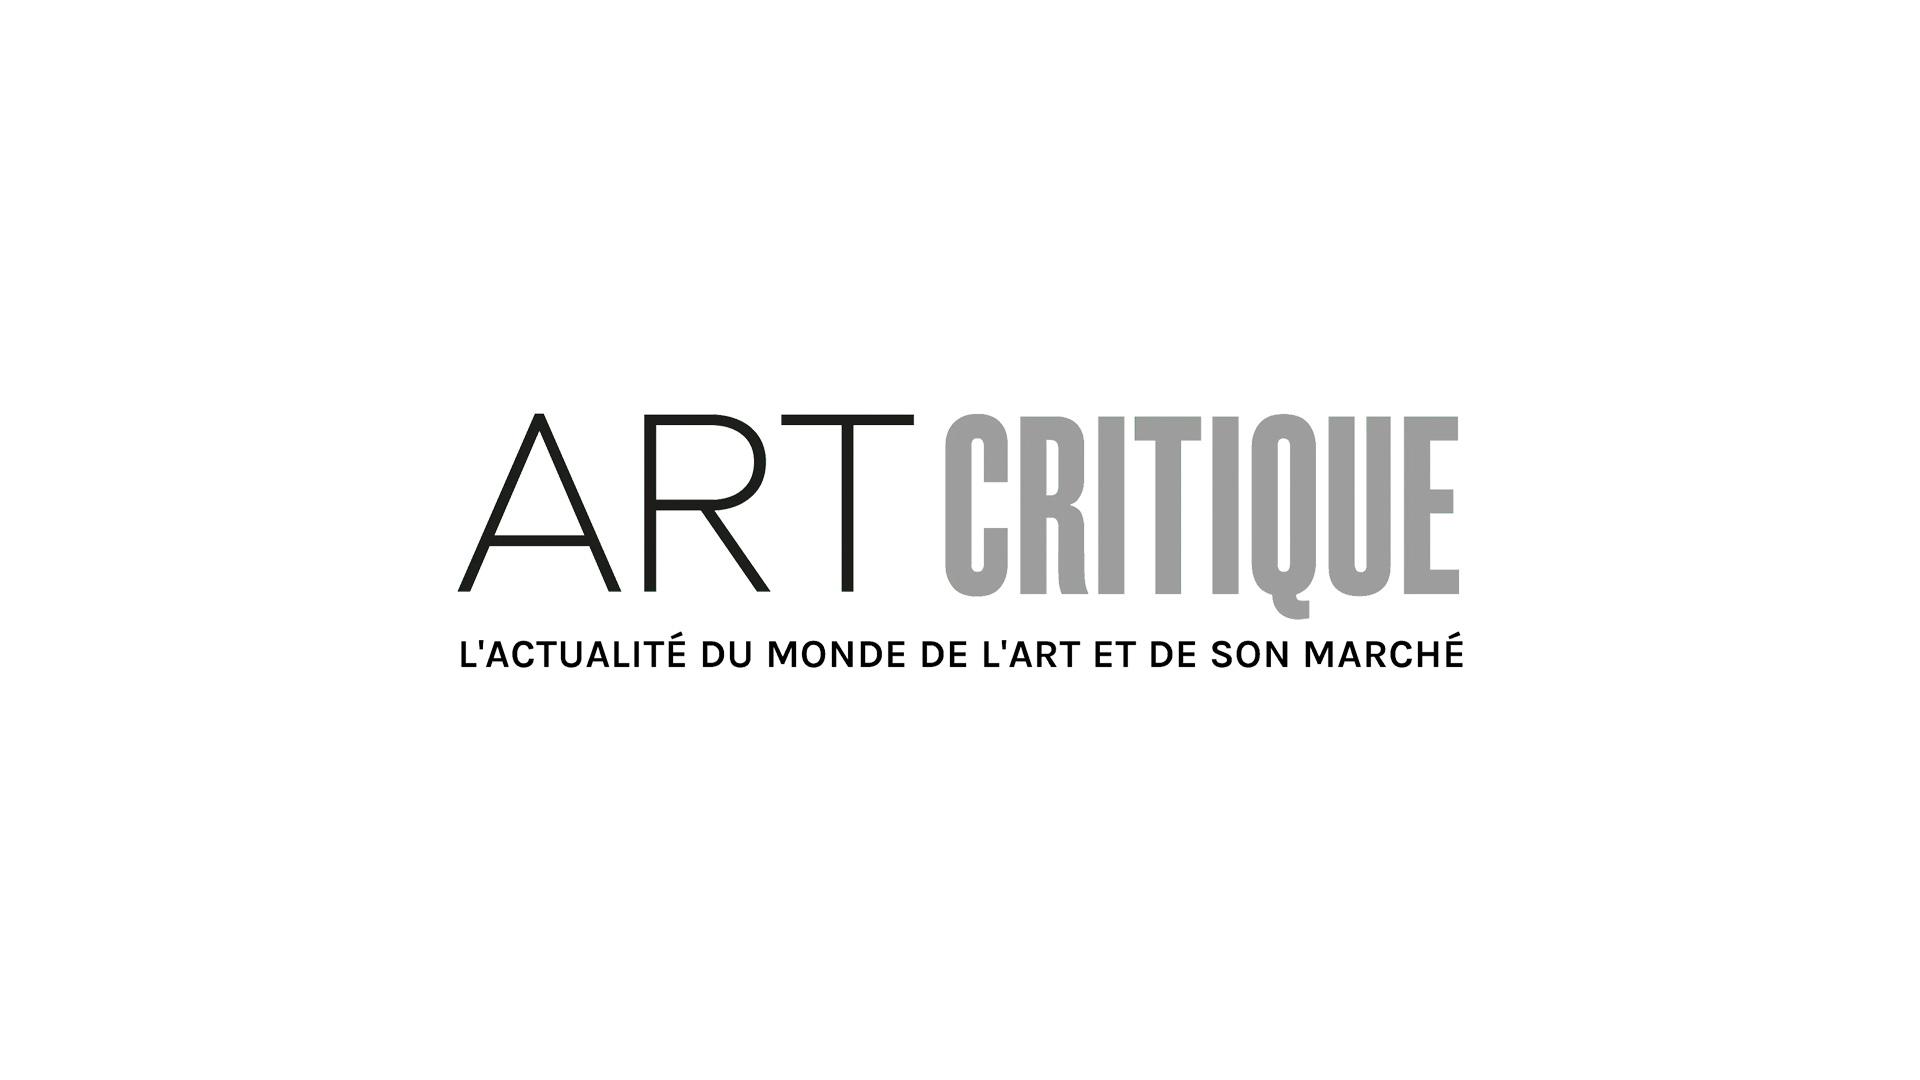 As part of their 100% Woman initiative, RIchard Saltoun Gallery introduced Matrescence